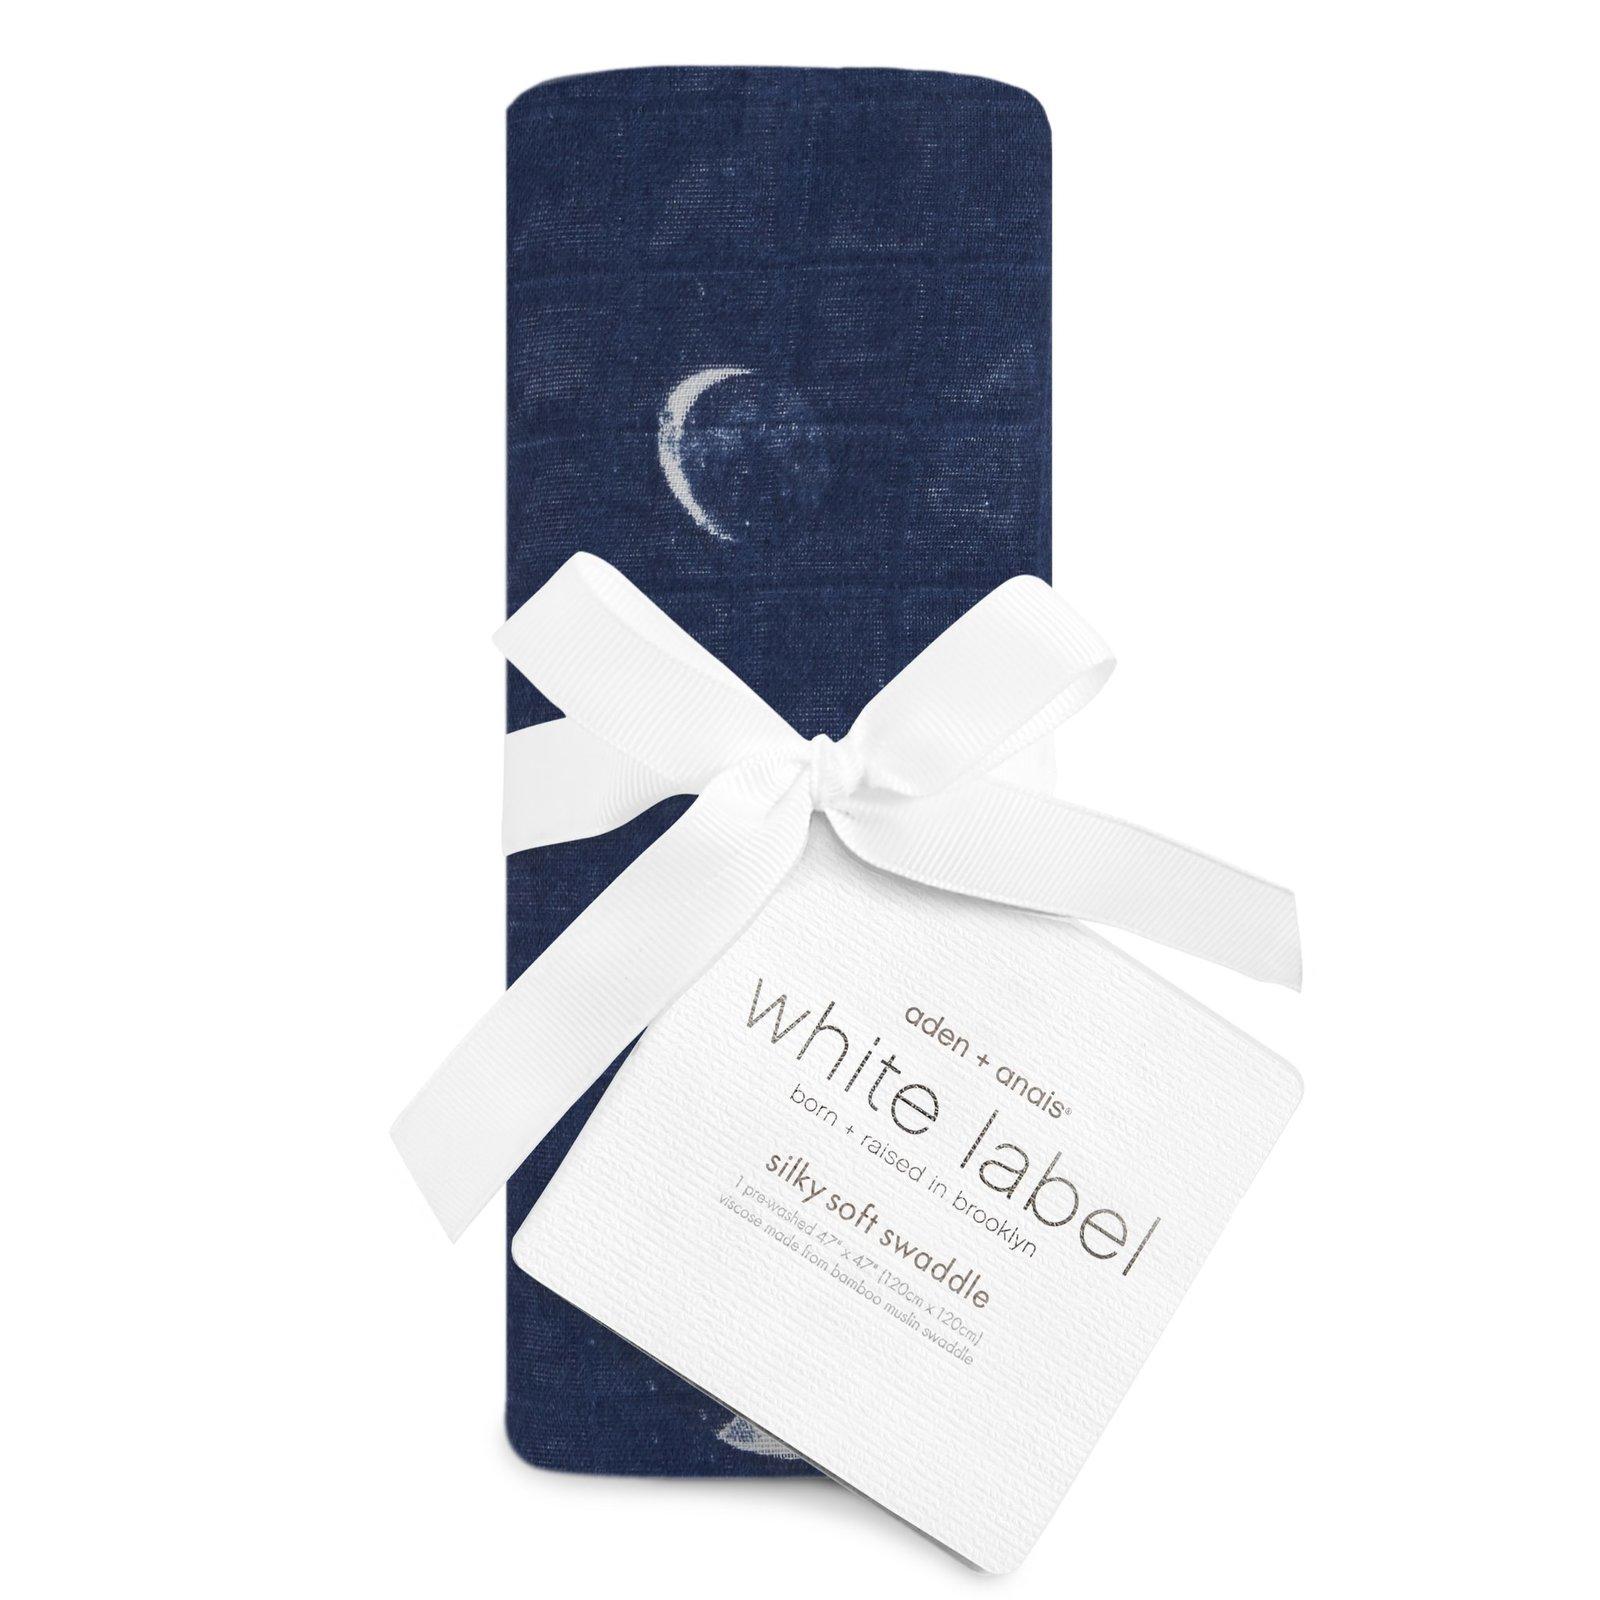 Aden + Anais: White Label Silky Soft Bamboo Muslin Swaddle - Stargaze/Luna (Single) image